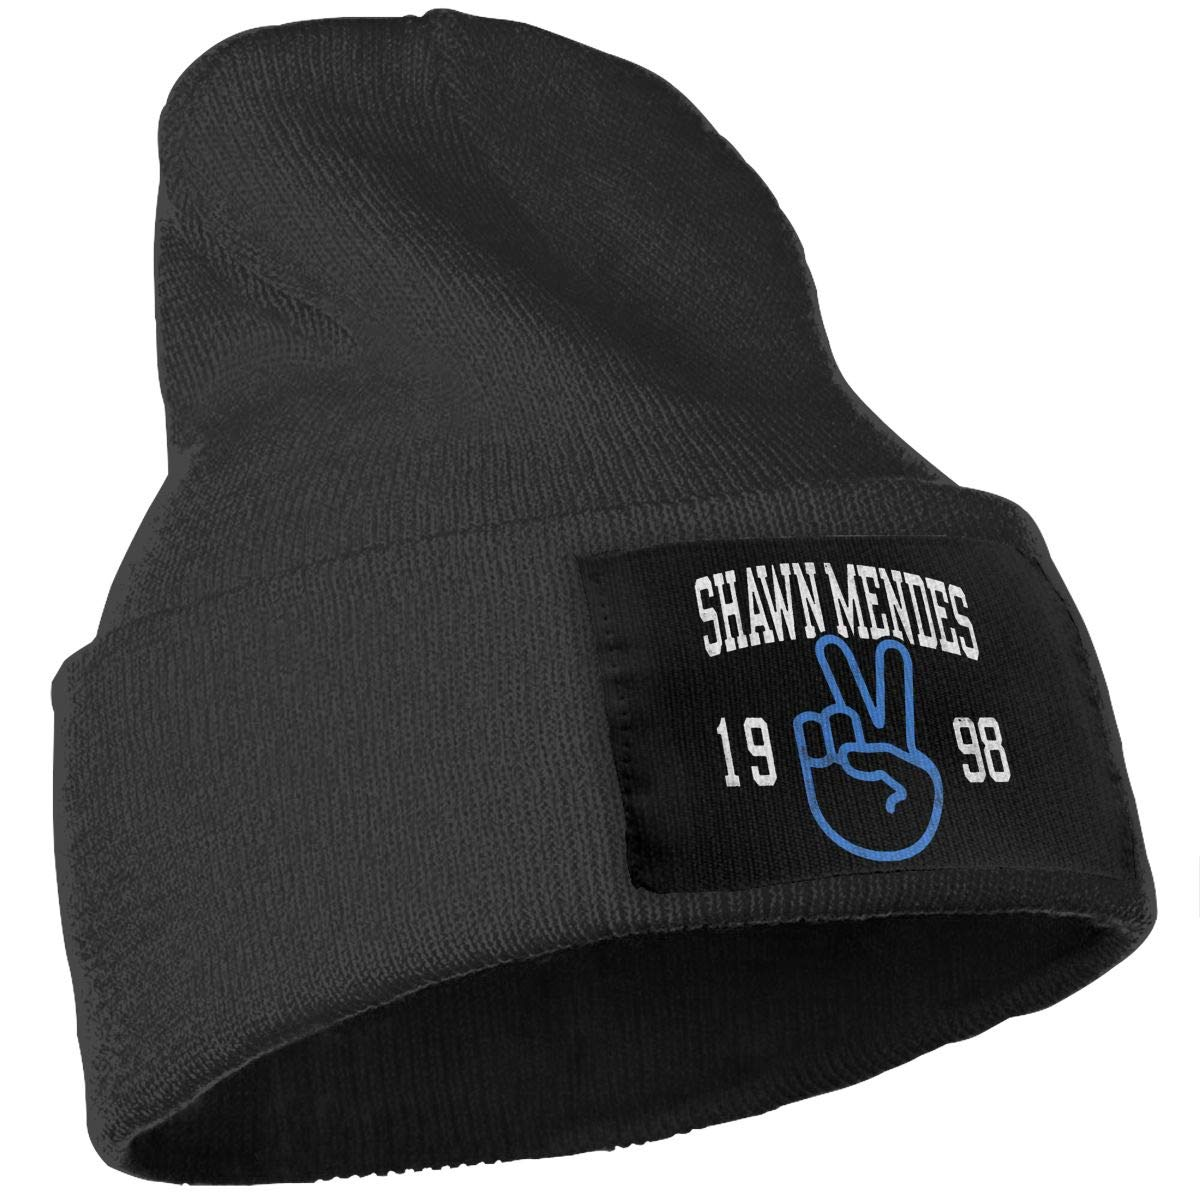 Hoodeid men women beanie hat shawn mendes knit hat at amazon men clothing  store jpg 1200x1200 8268994422fd